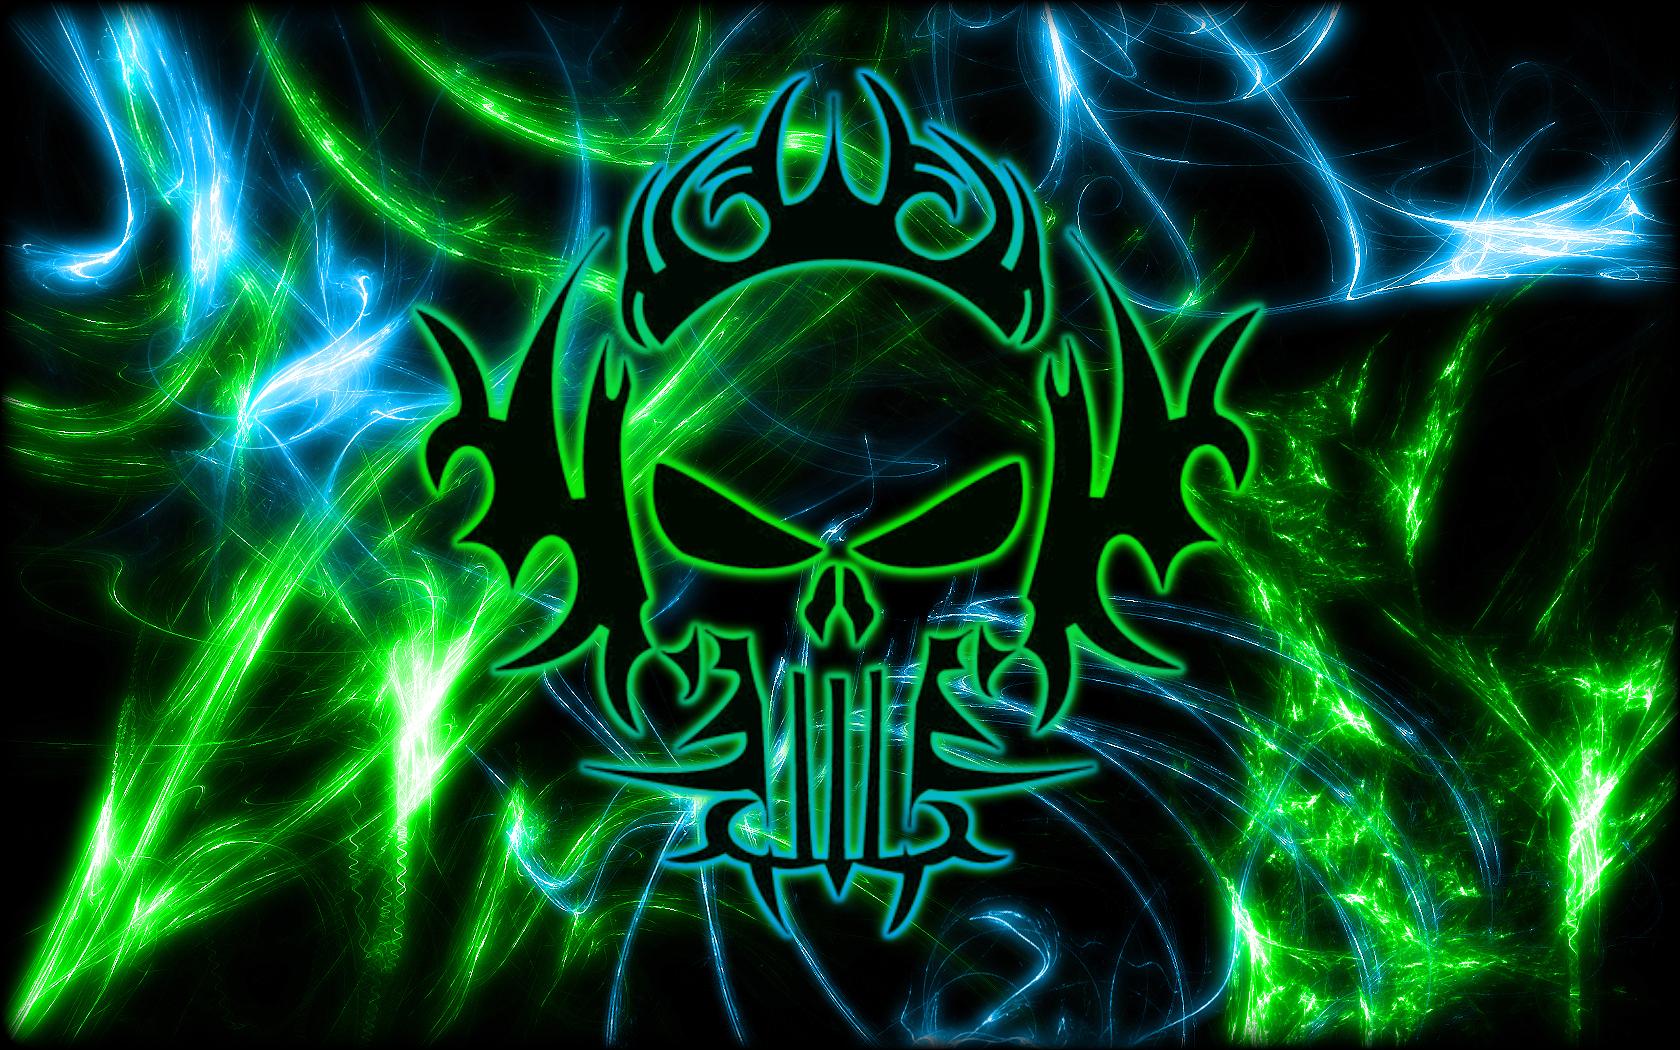 Cool HD Skull Wallpapers 47 Wallpapers  avantebiz